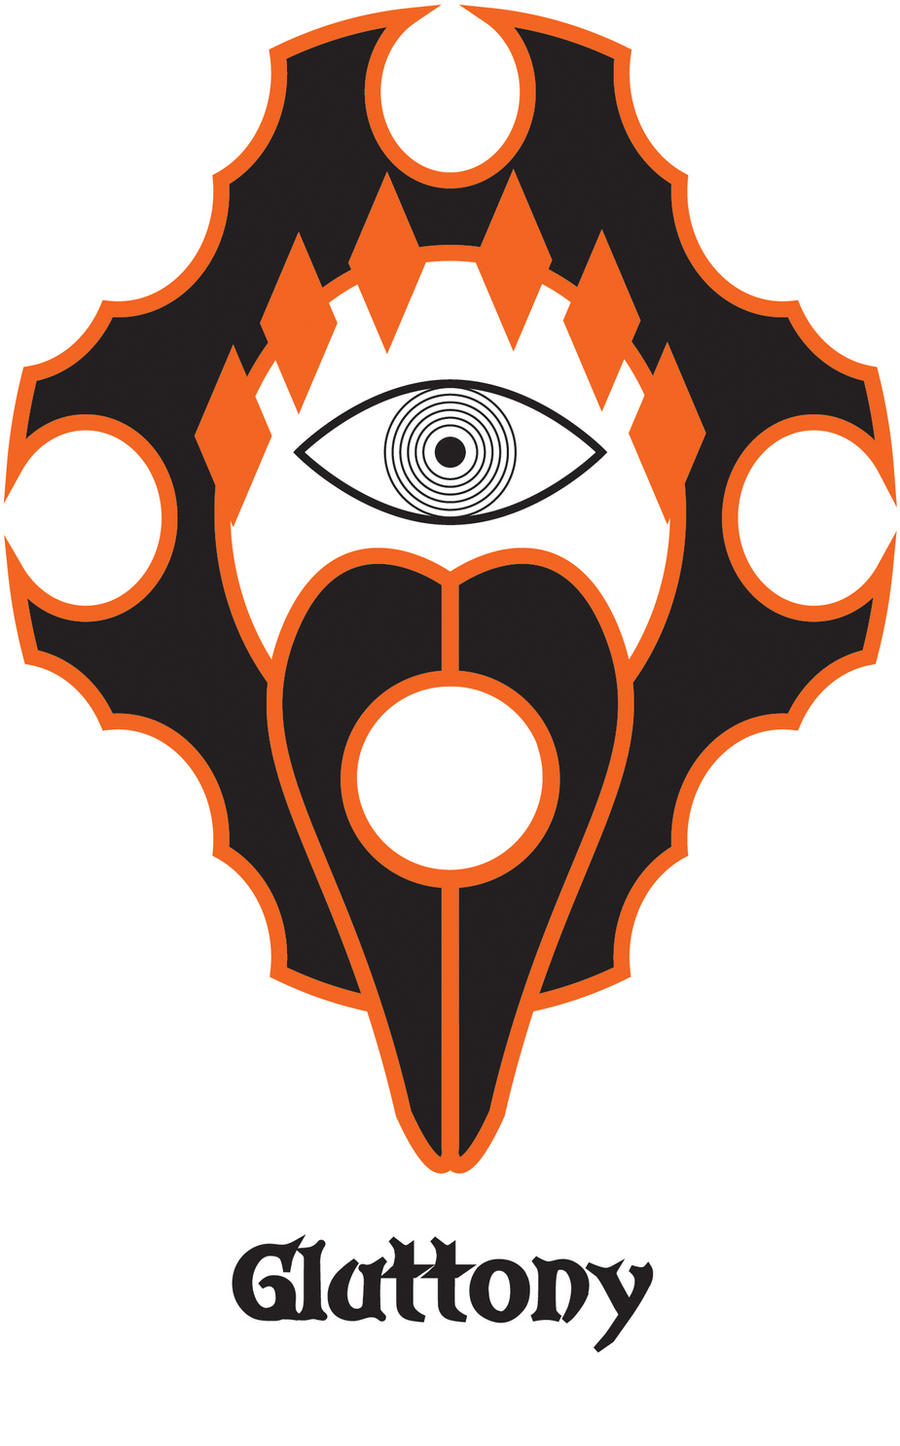 Sin symbol wrath by larsjack on deviantart sin symbol gluttony by larsjack biocorpaavc Choice Image